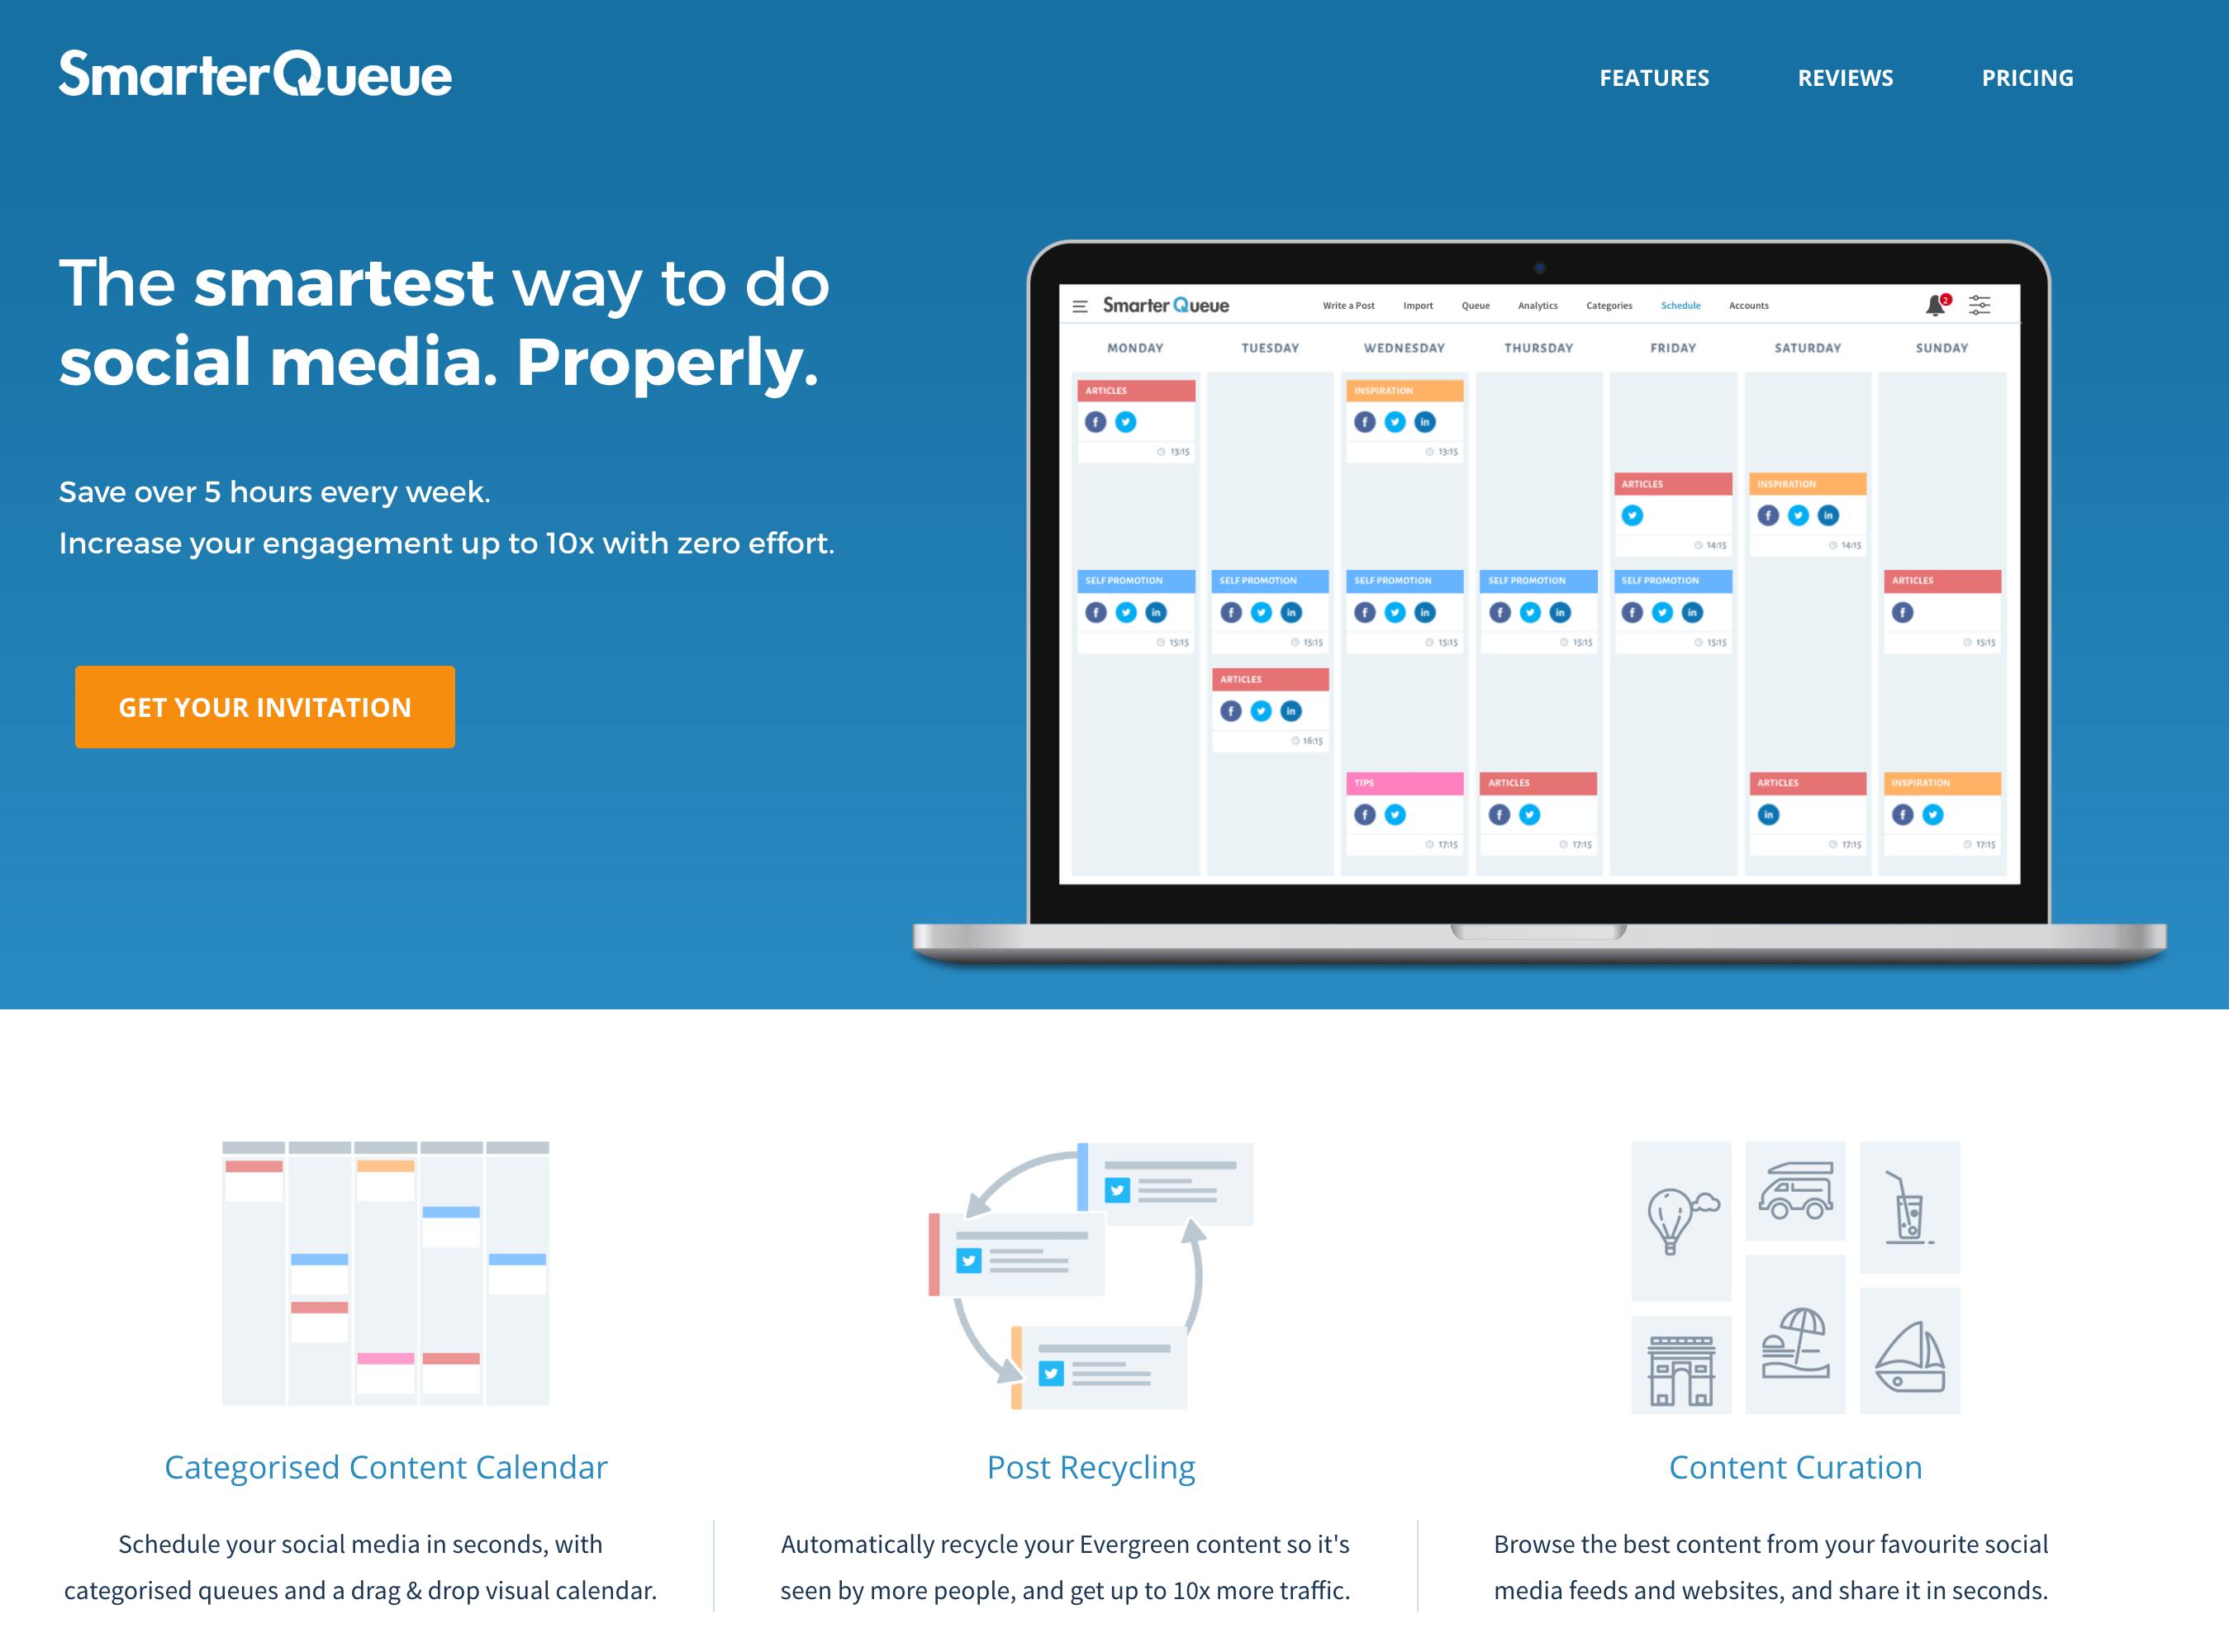 SmarterQueue beta landing page 2016 - the smartest way to do social media. properly